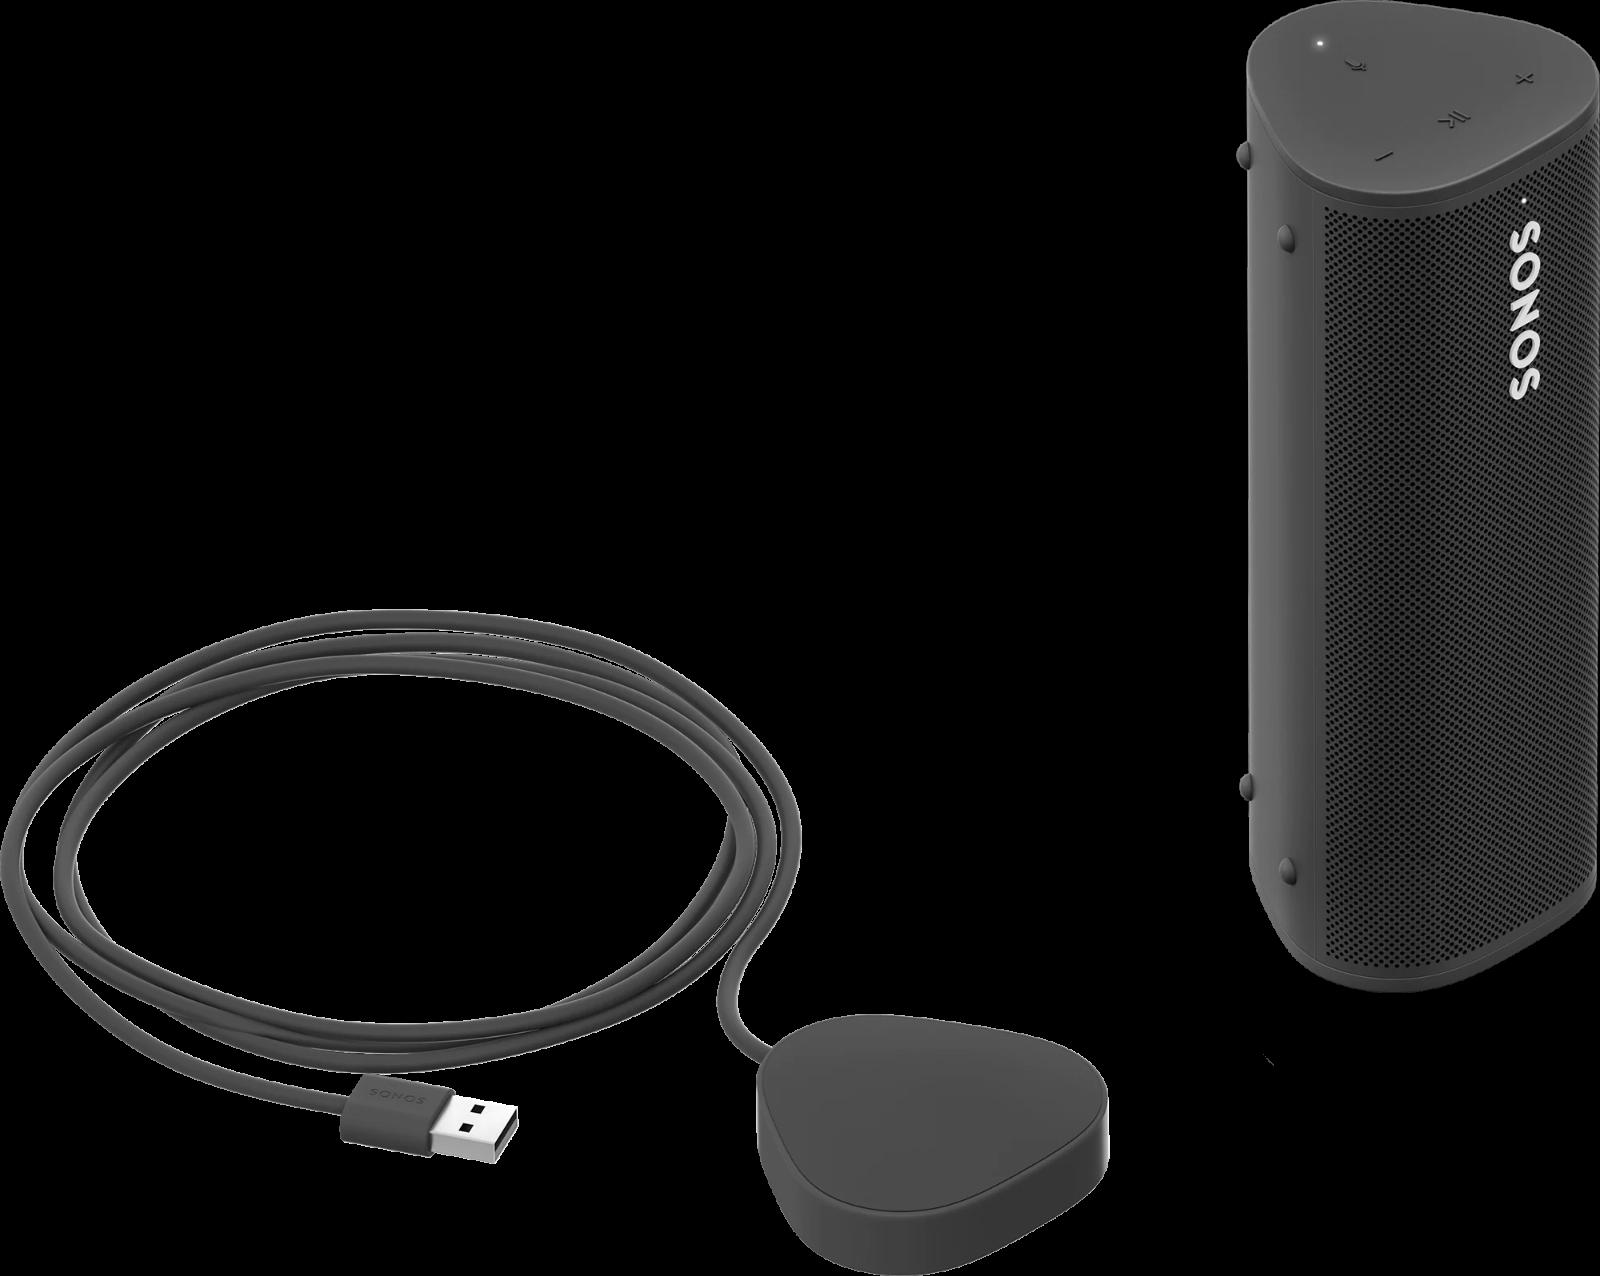 roam-plus-wireless-charger-black